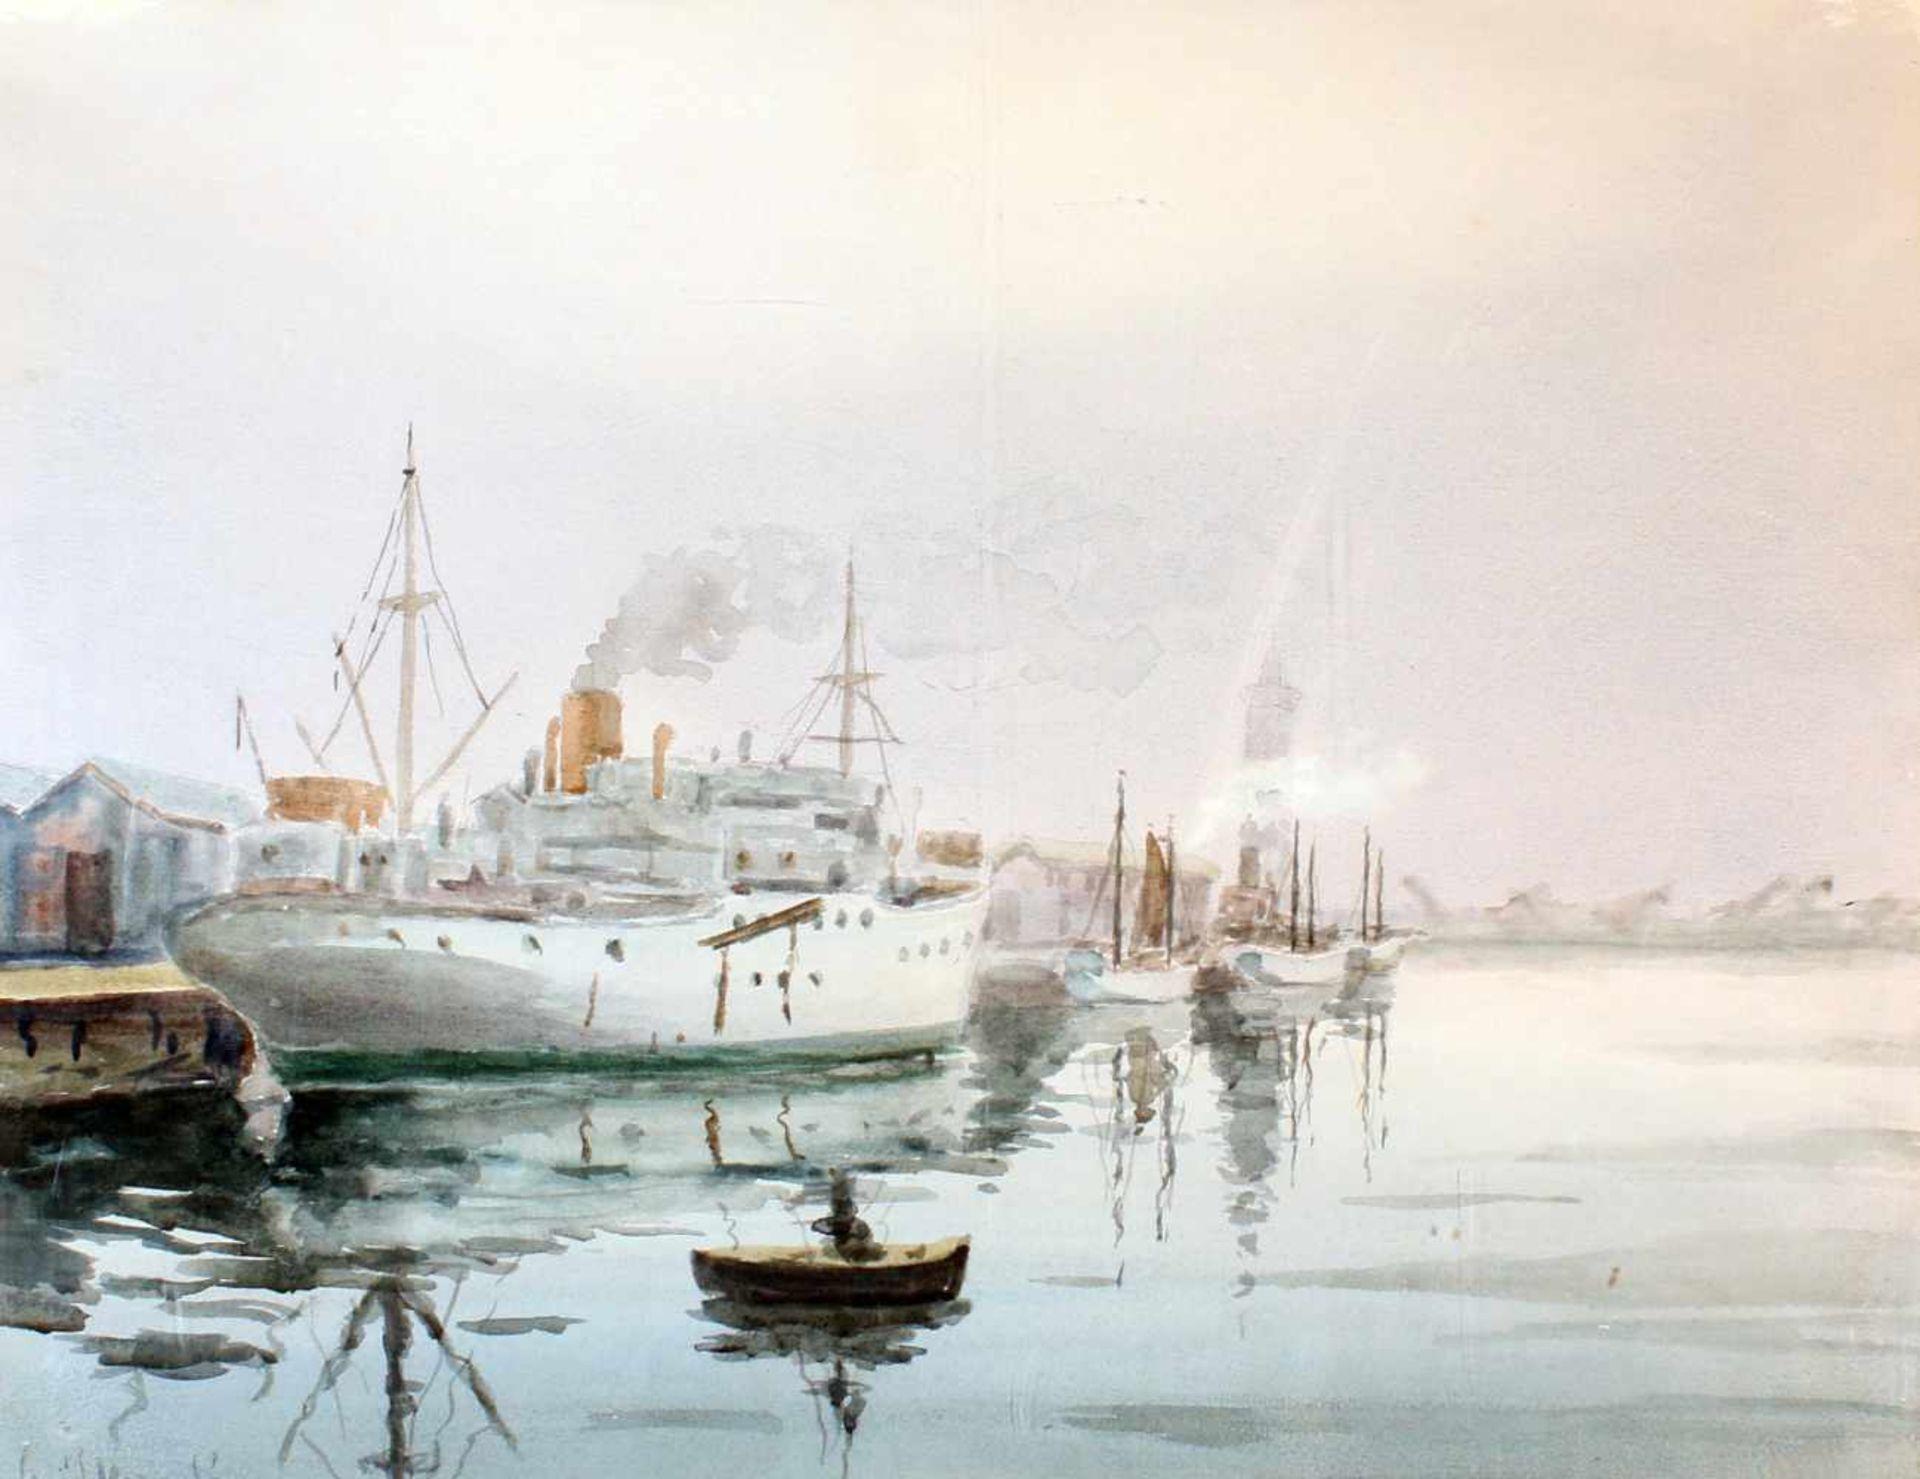 """Dampfer im Hafen"" - David Mercadé Recasens (20. Jahrhundert)Aquarell auf Papier, unten links"